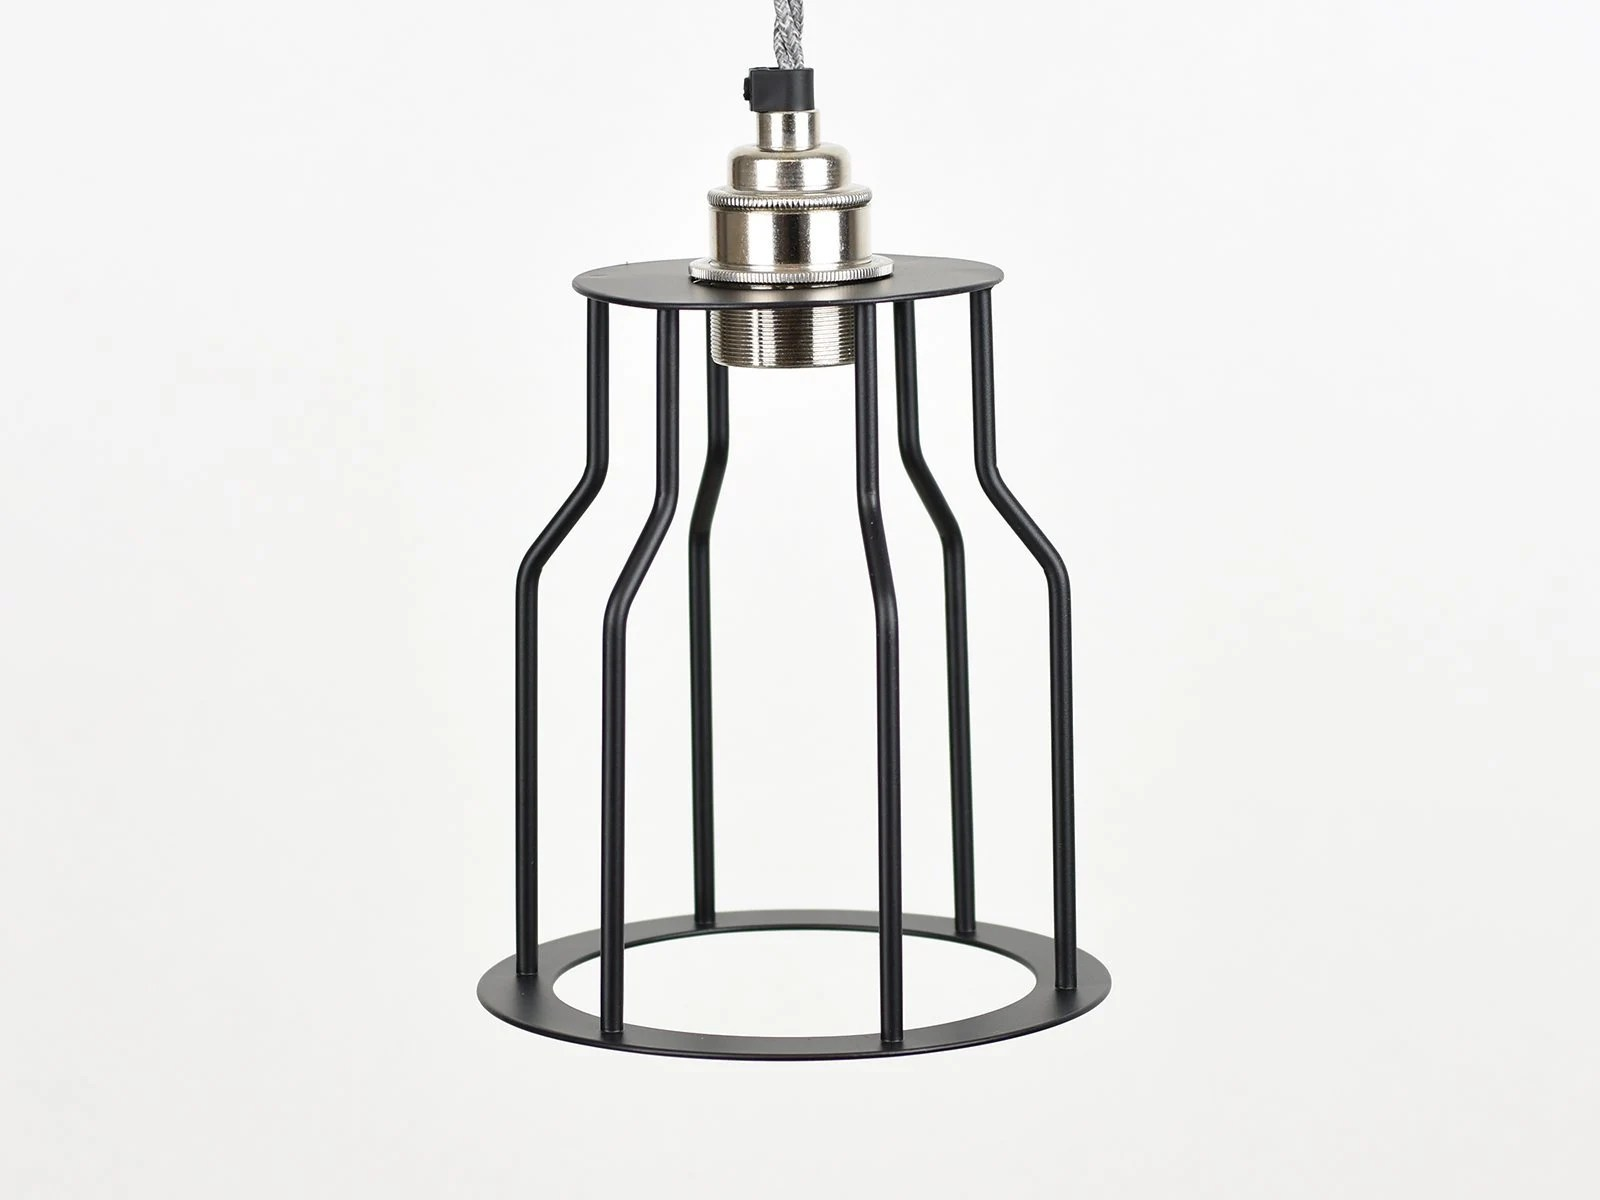 Vintage Industrial Pendant Wire bottleneck Cage shade for